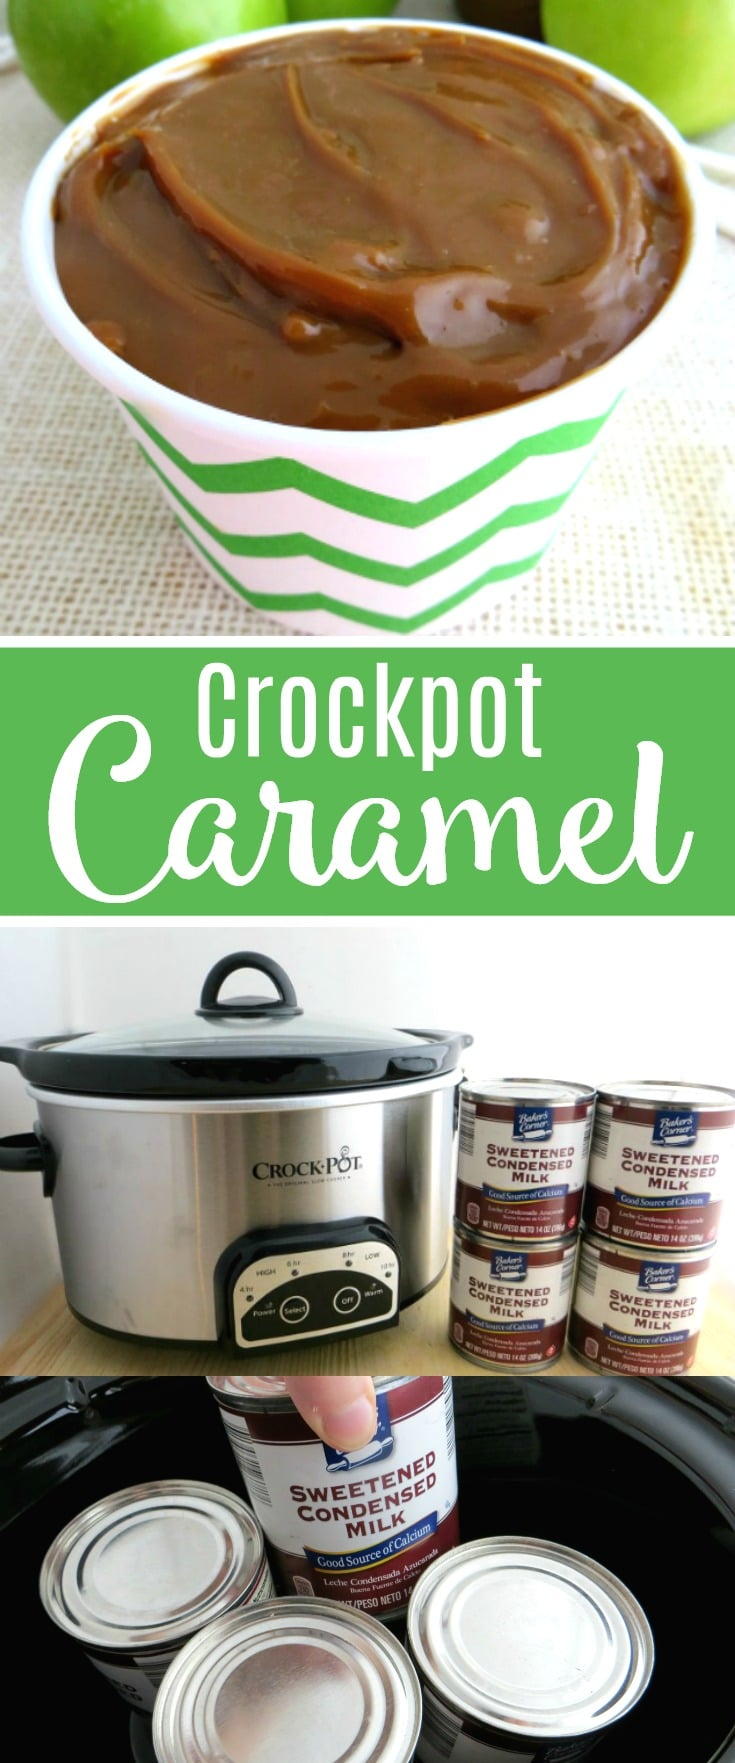 crockpot caramel recipe